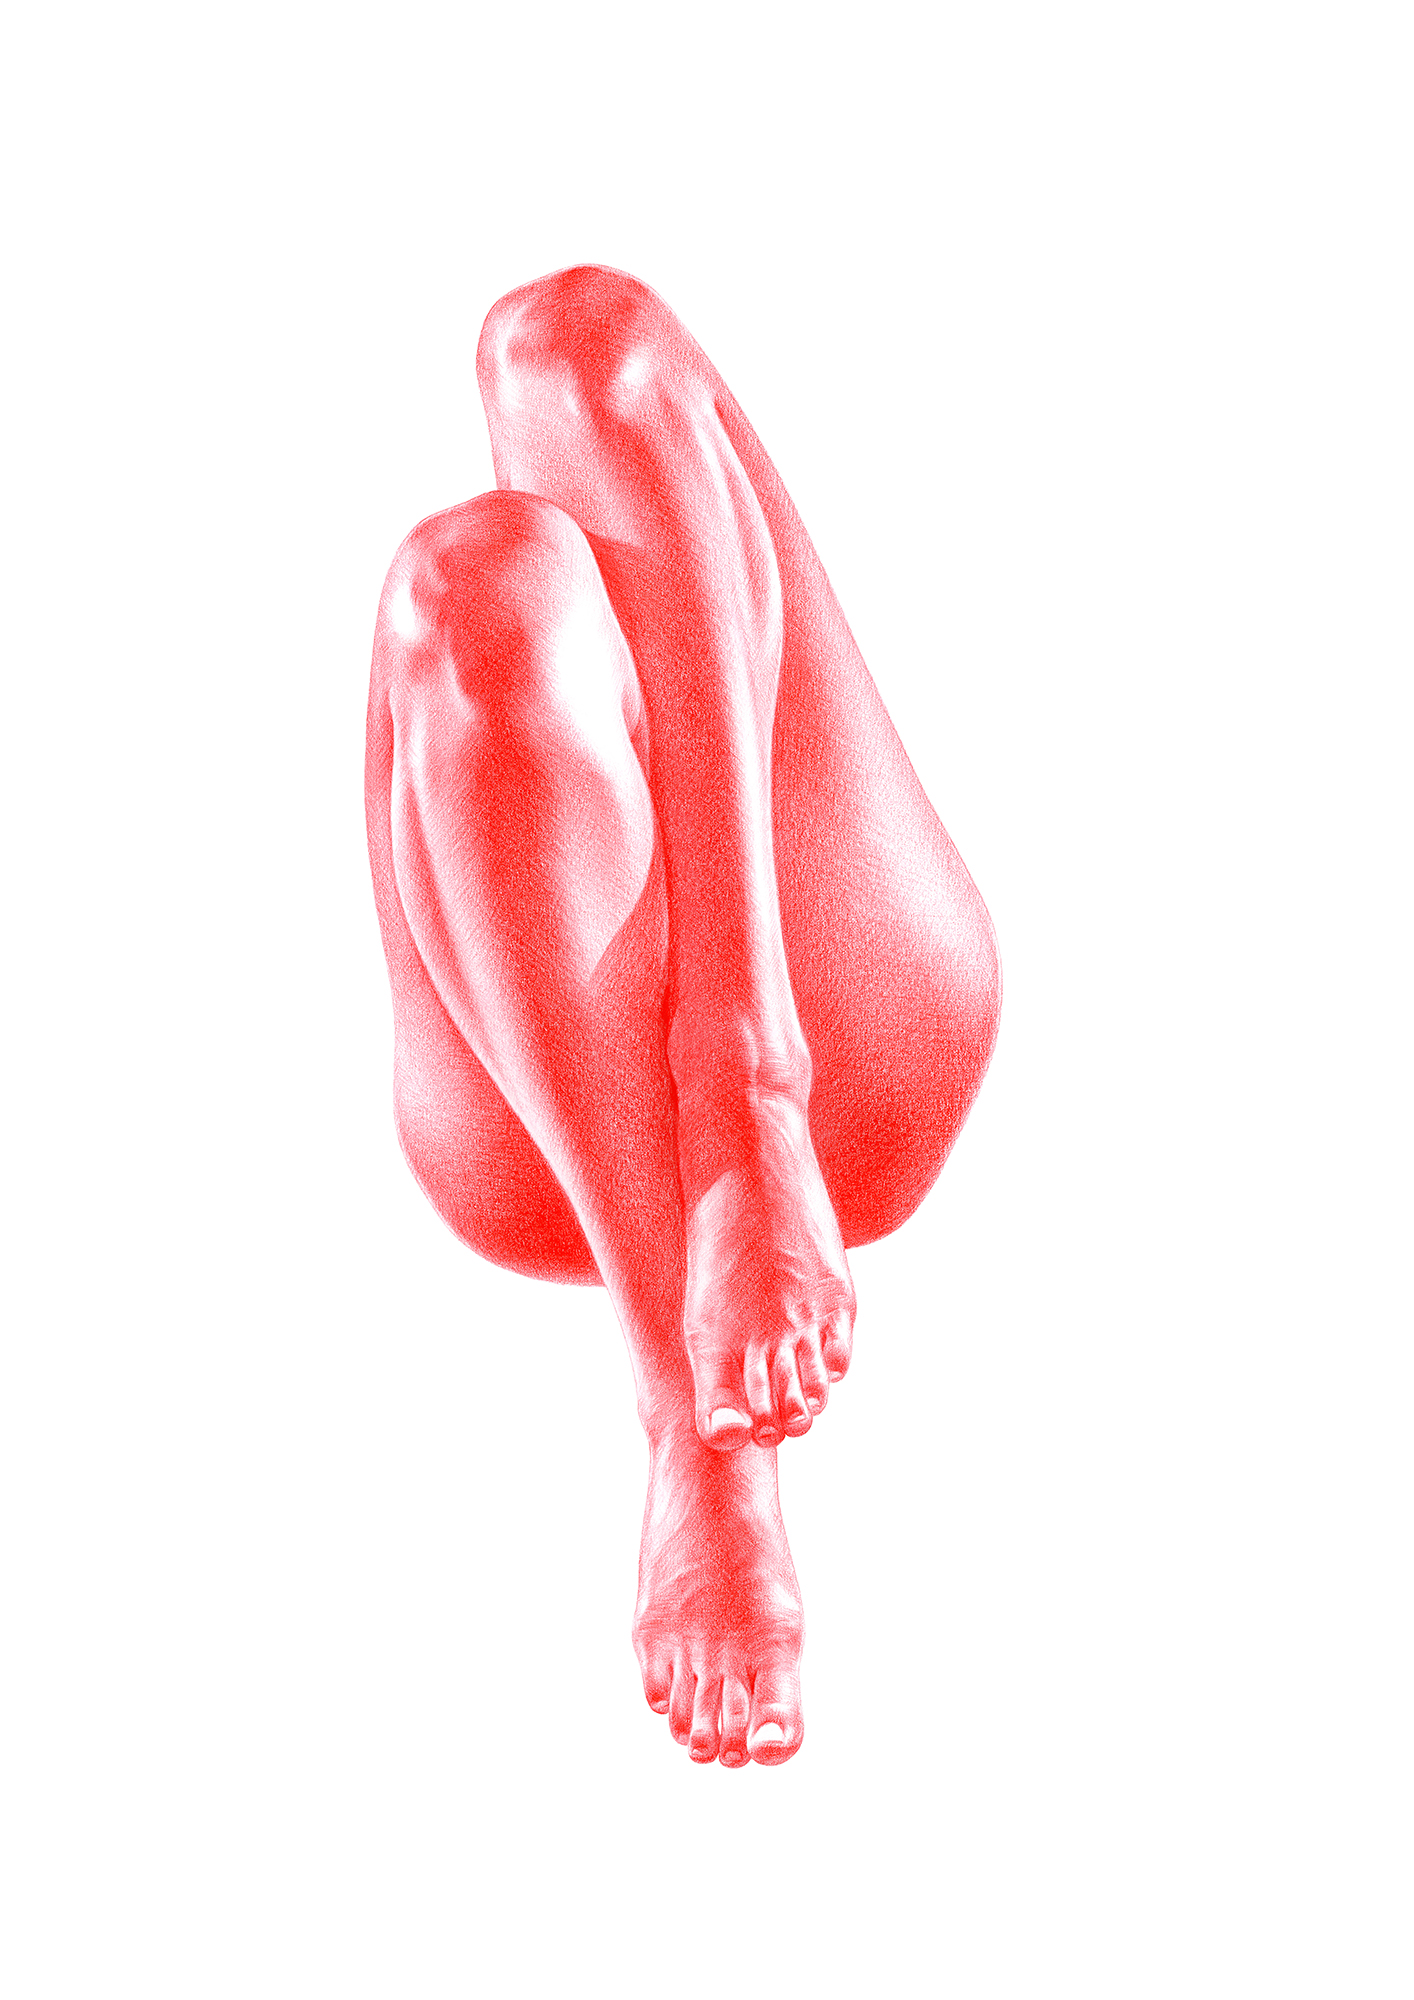 Legssmall.jpg